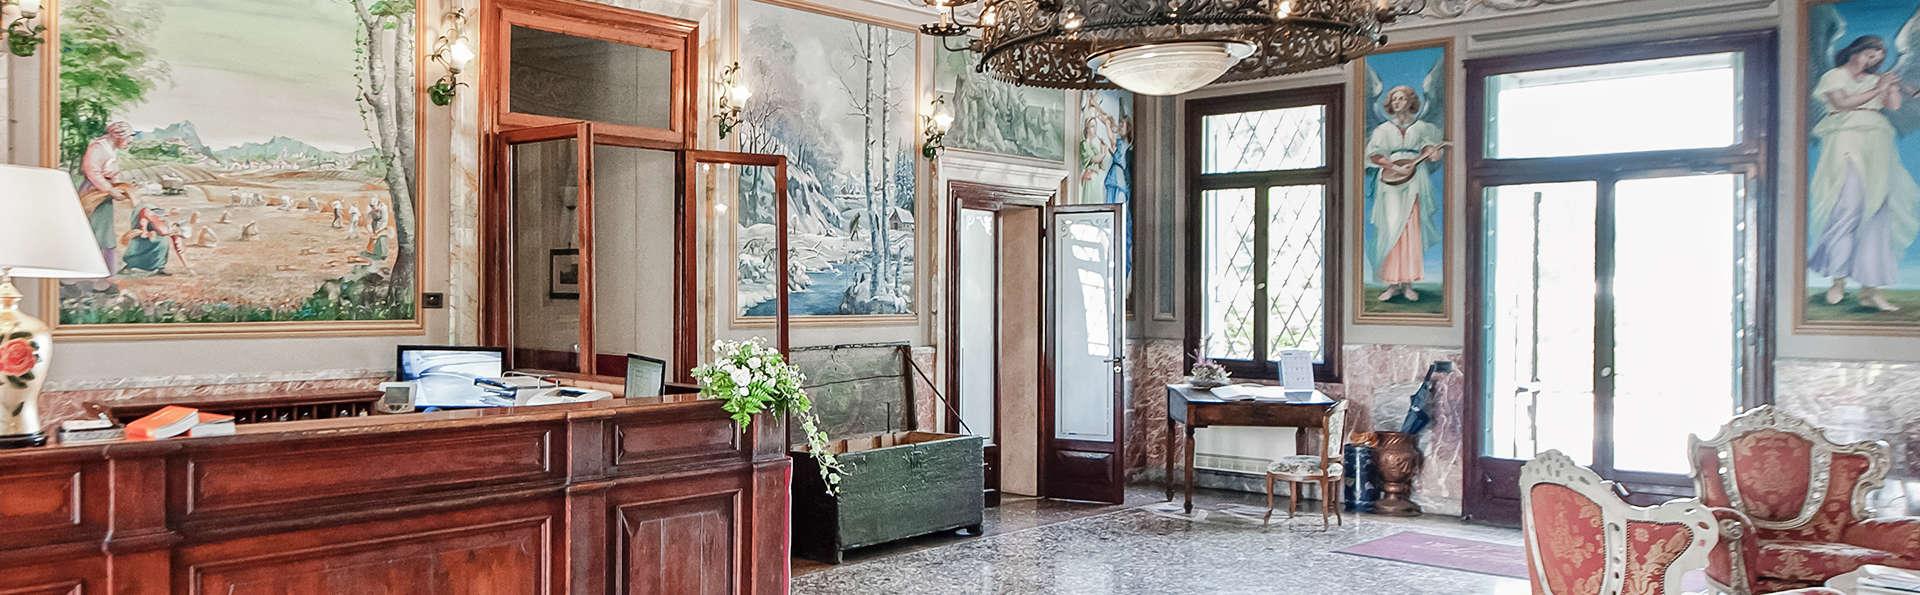 Best Western Plus Hotel Villa Tacchi - edit_reception.jpg